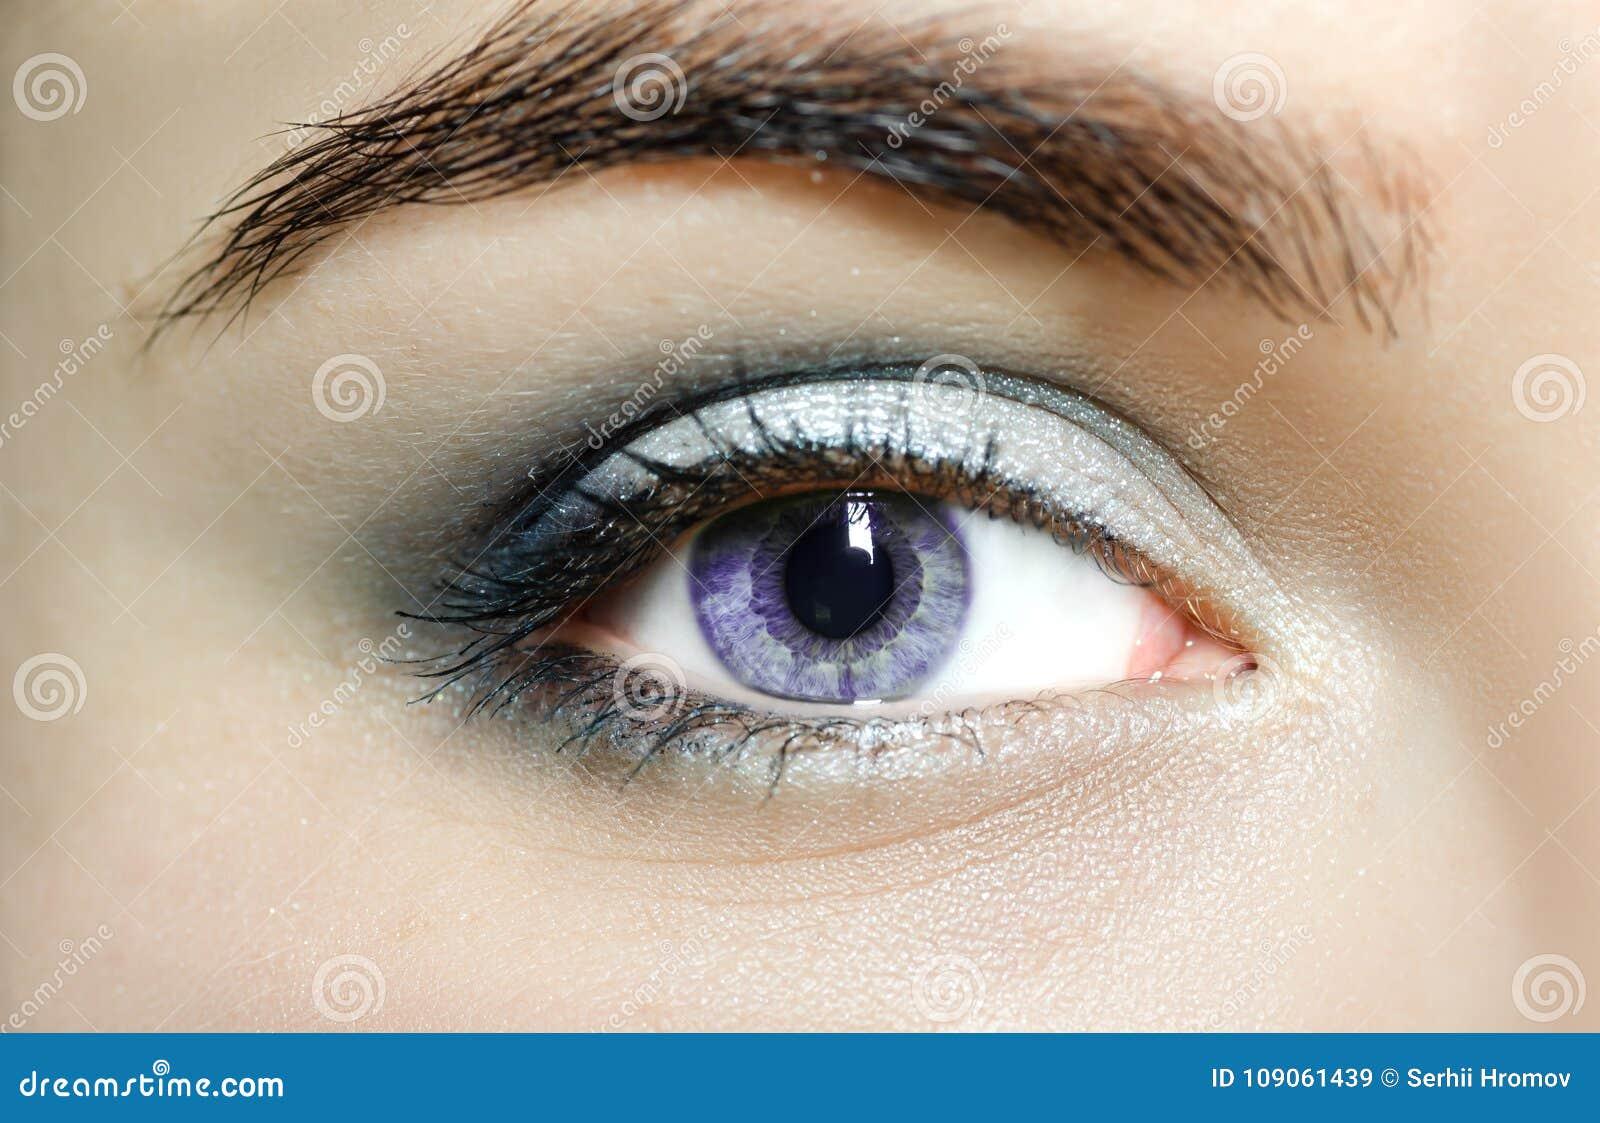 Violet Eyes Mutation Eyes, Close Up. The Human Eye Of A ...  Violet Eyes Mutation